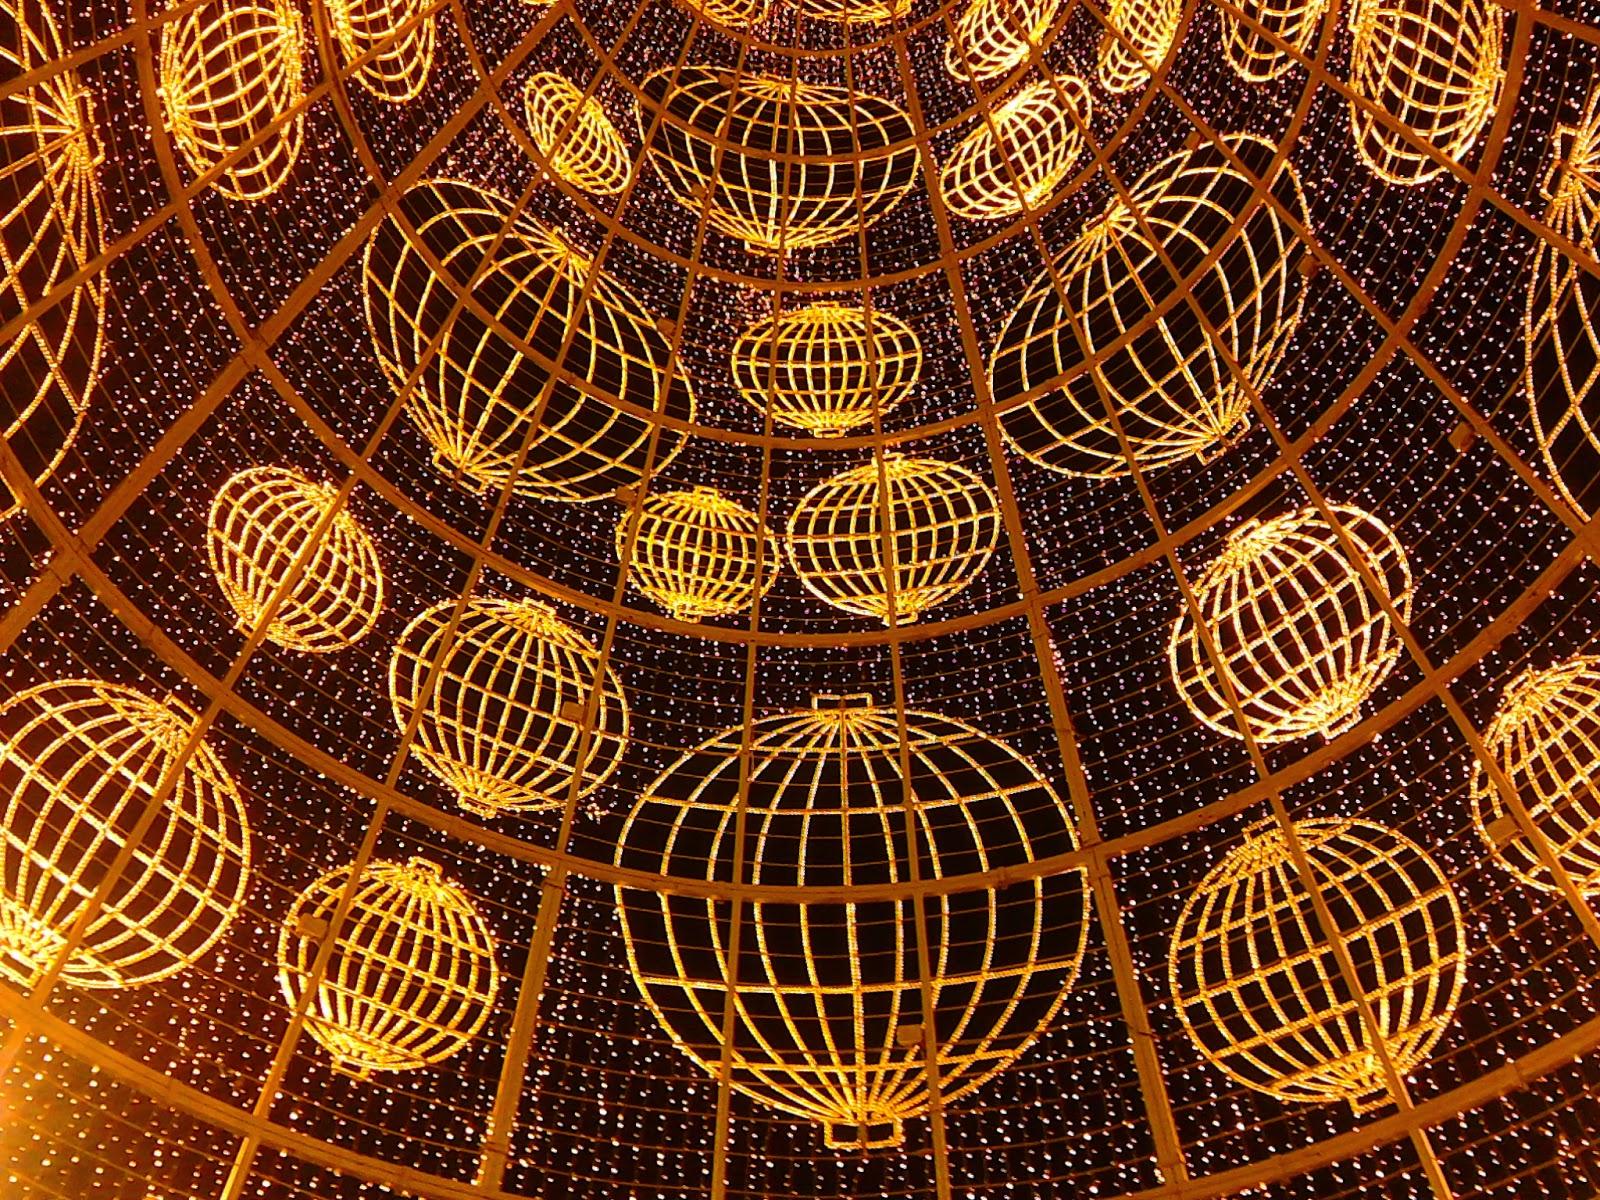 anuncio lotería, anuncio lotería Navidad 2014, premio gordo 2014,suerte,calvo lotería, bar antonio lotería, décimo manolo, bar villaverde anuncio lotería,bombo,ilusión,magia